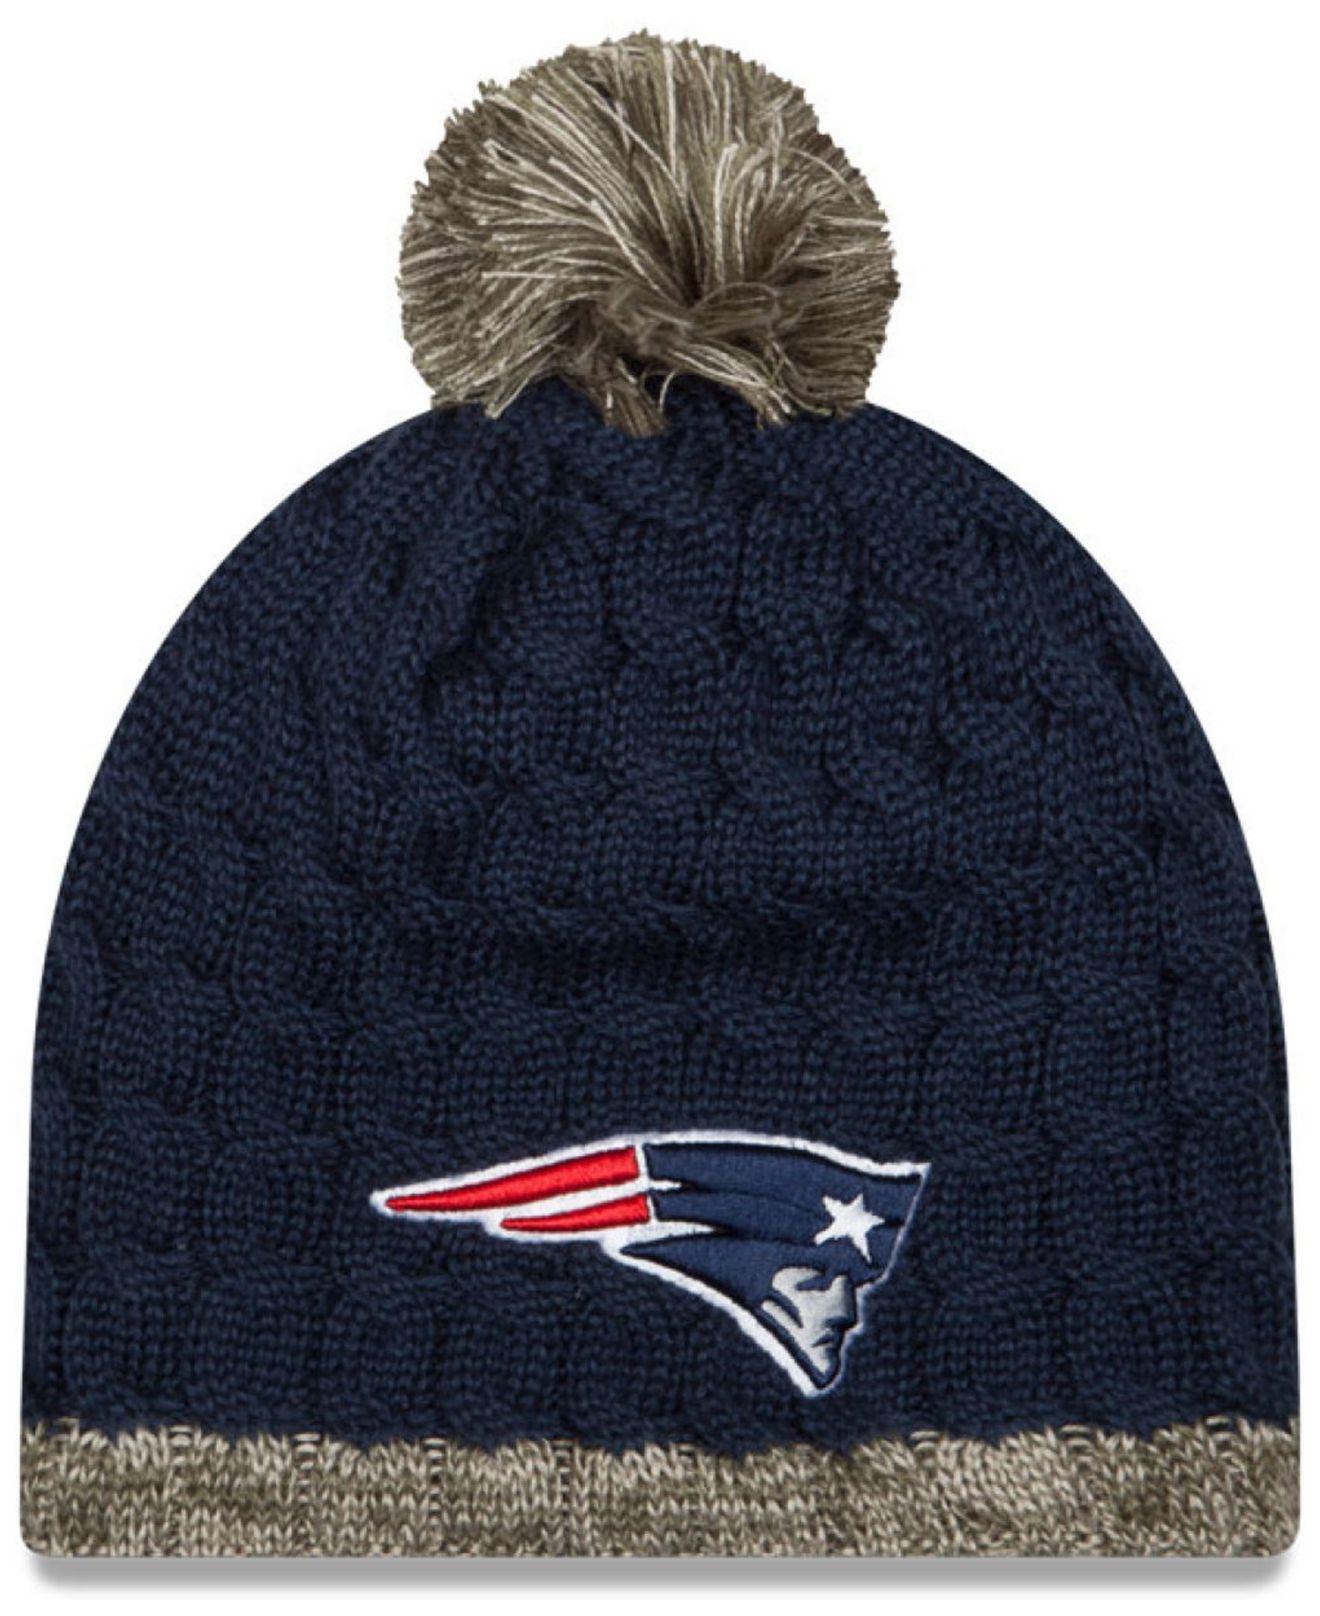 383b745a338 ... shop lyst ktz womens new england patriots salute to service knit hat  0475f 86613